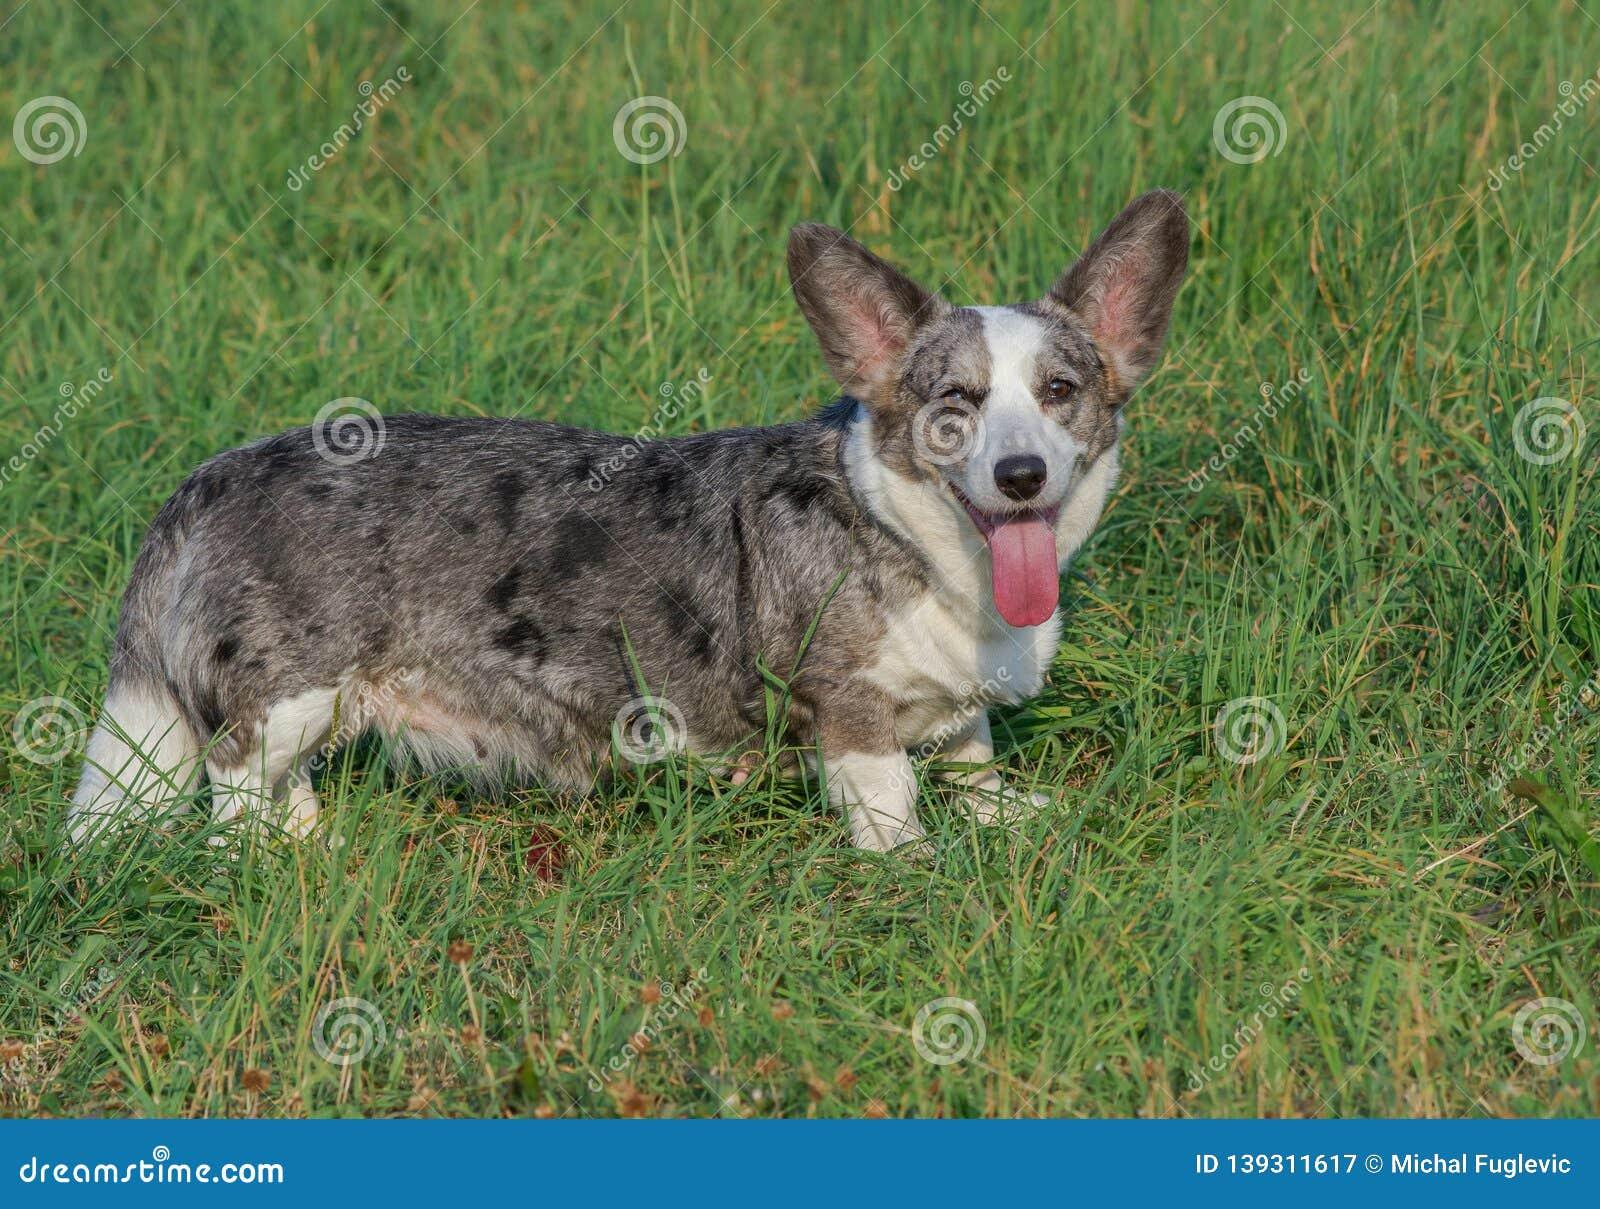 Welsh Corgi Cardigan Dog Breed Information and Personality Traits